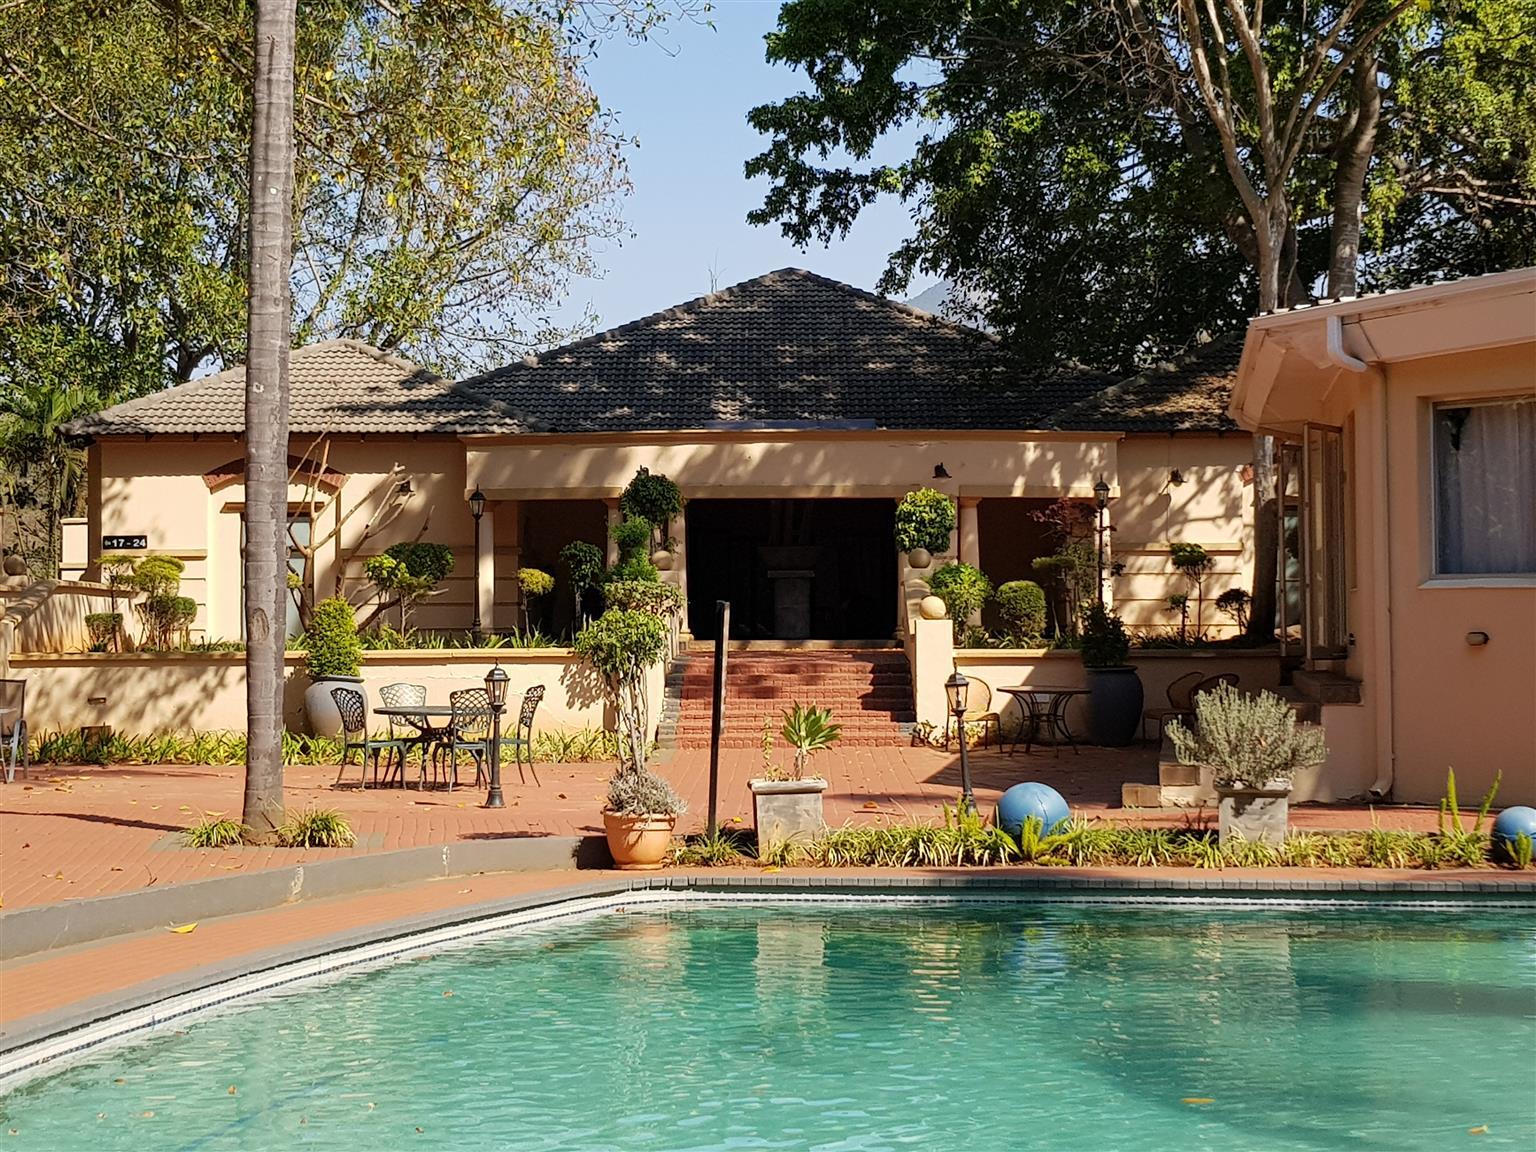 Mbombela Resort and Spa (1 Item)